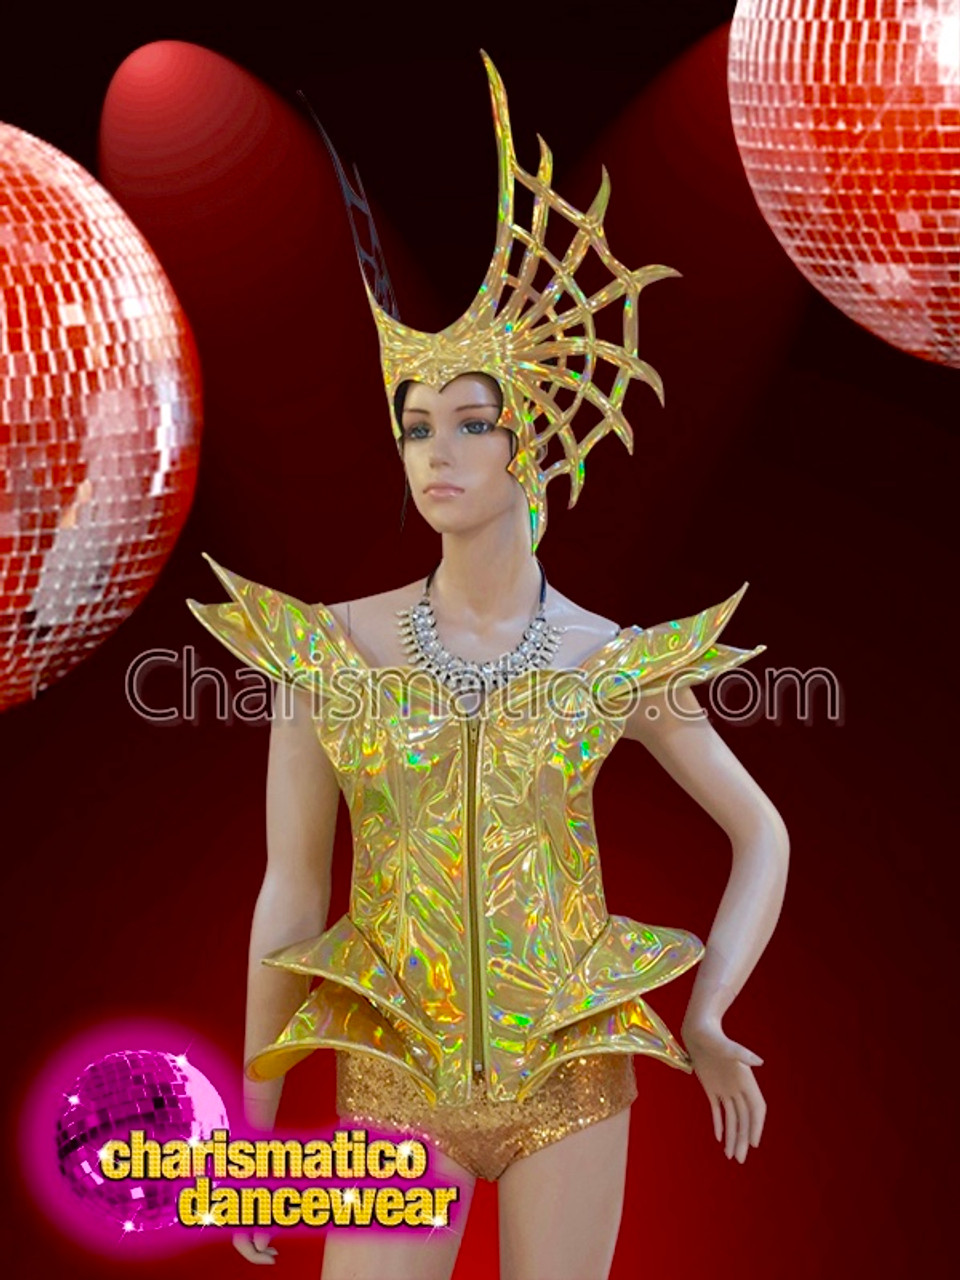 CHARISMATICO Girl/'s Retro Golden glitter Bouffant Headdress With Big Red Bow